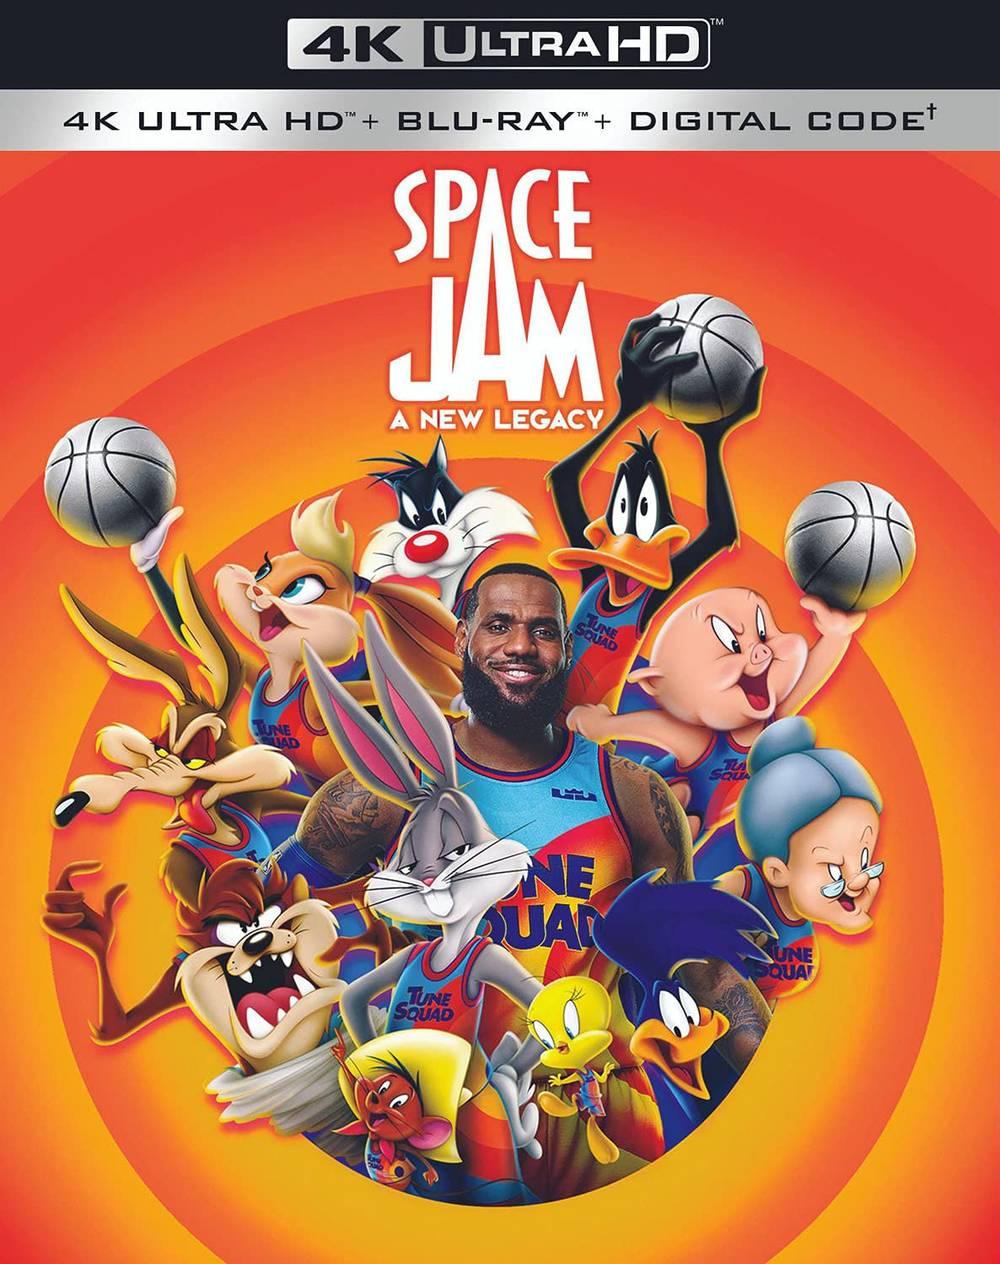 Space Jam [Movie] - Space Jam: A New Legacy [4K]